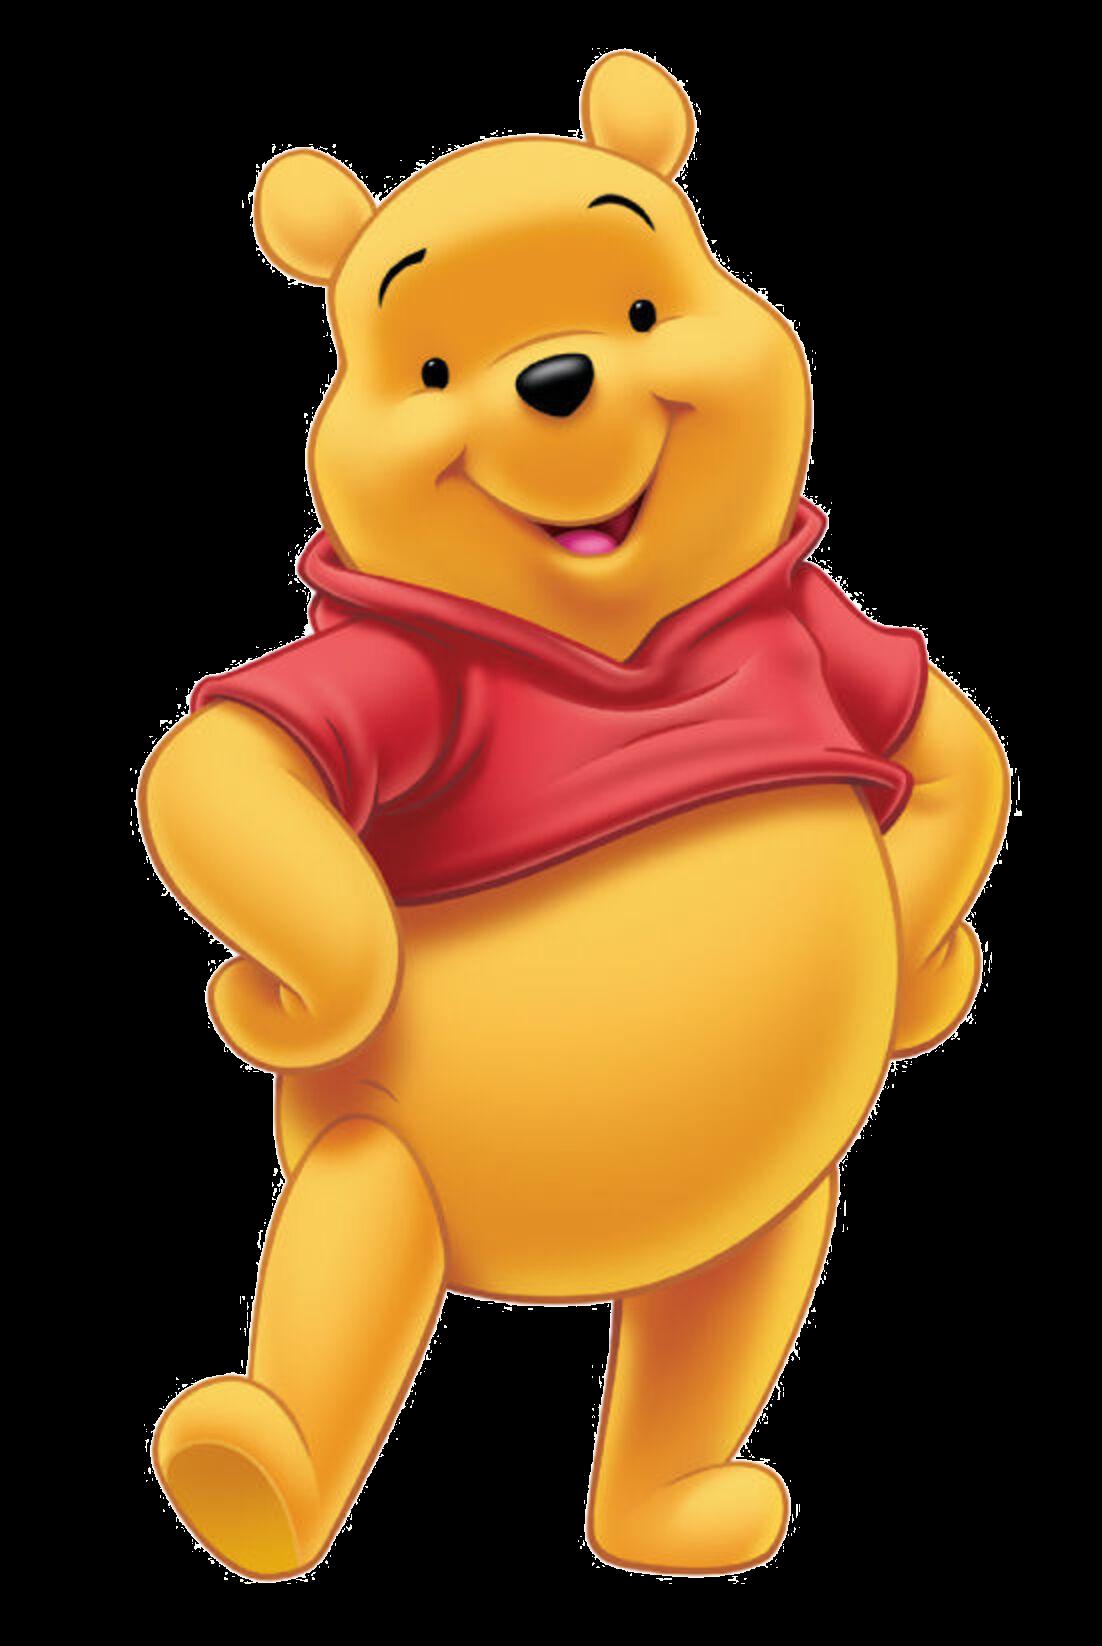 Imagenes de Winnie Pooh. Tiernas para Celular. Fondos【 IMAGENES ...